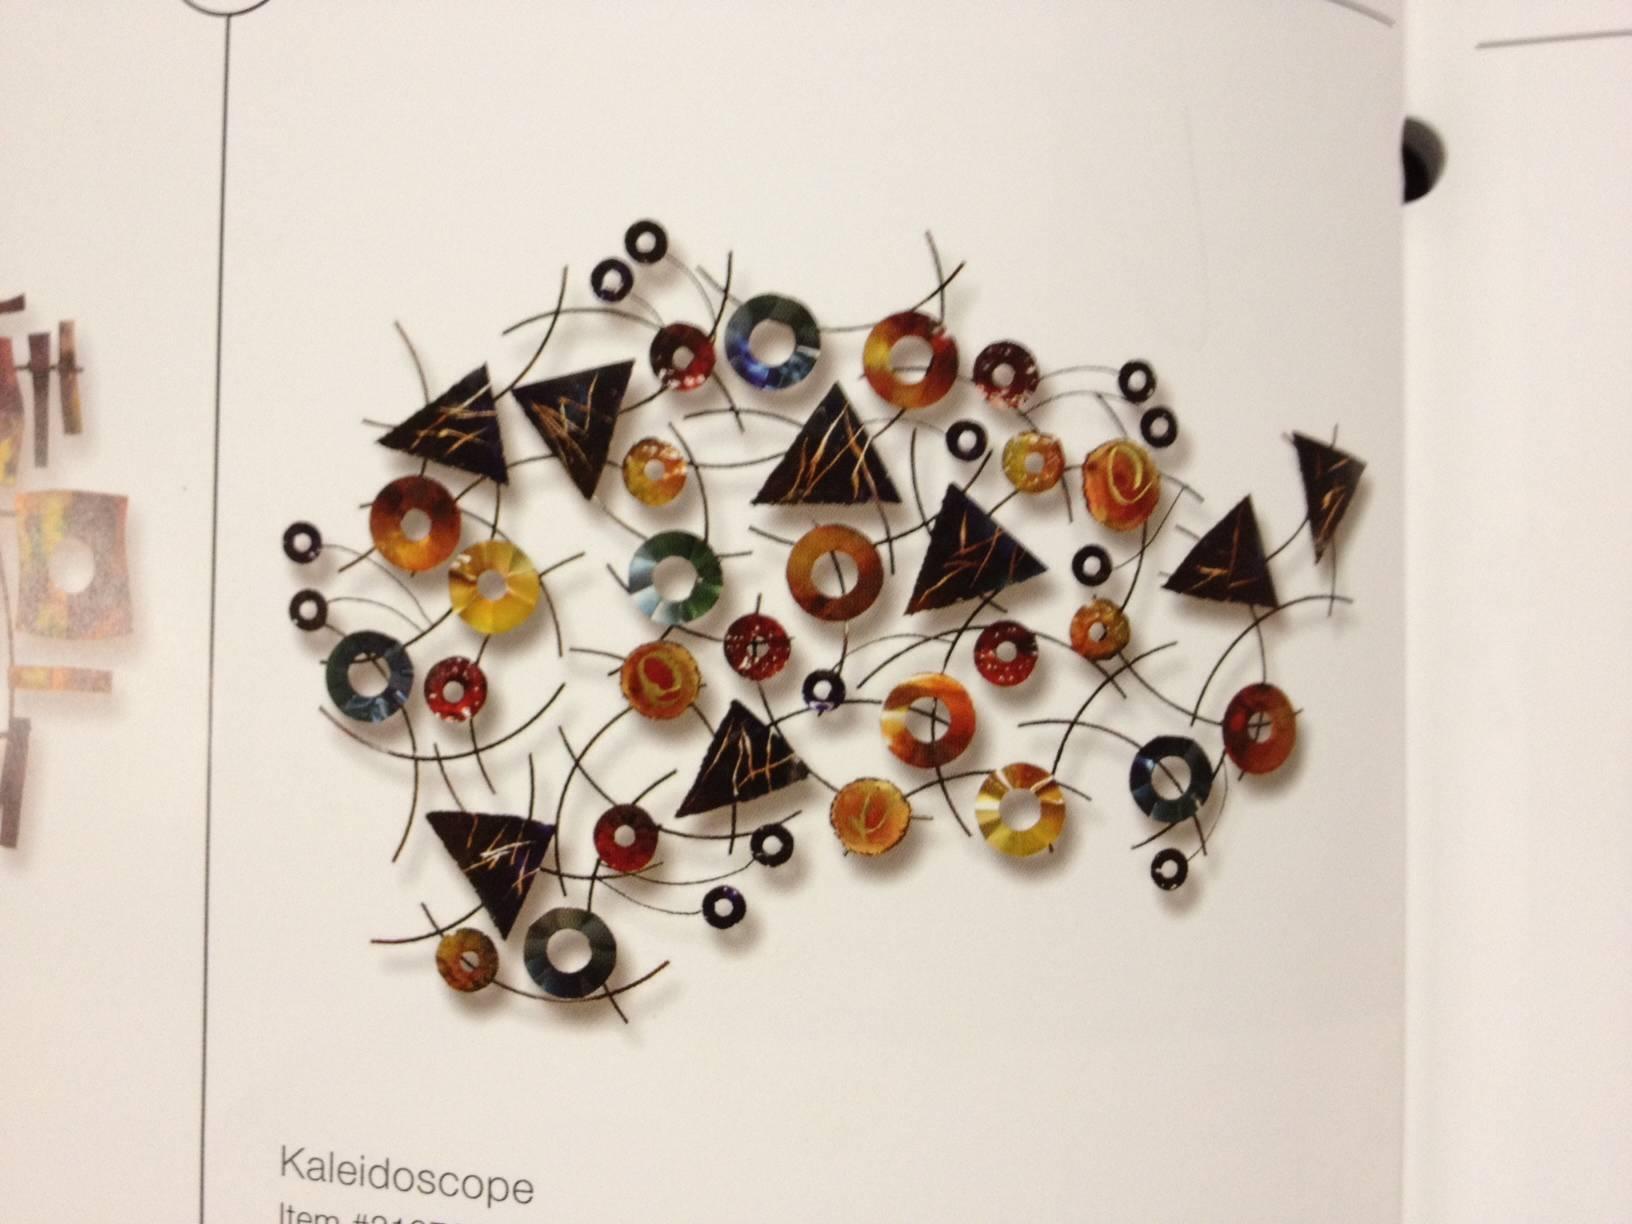 Kaleidoscope Metal Sculpture Wall Art Within Current Kaleidoscope Wall Art (View 8 of 20)